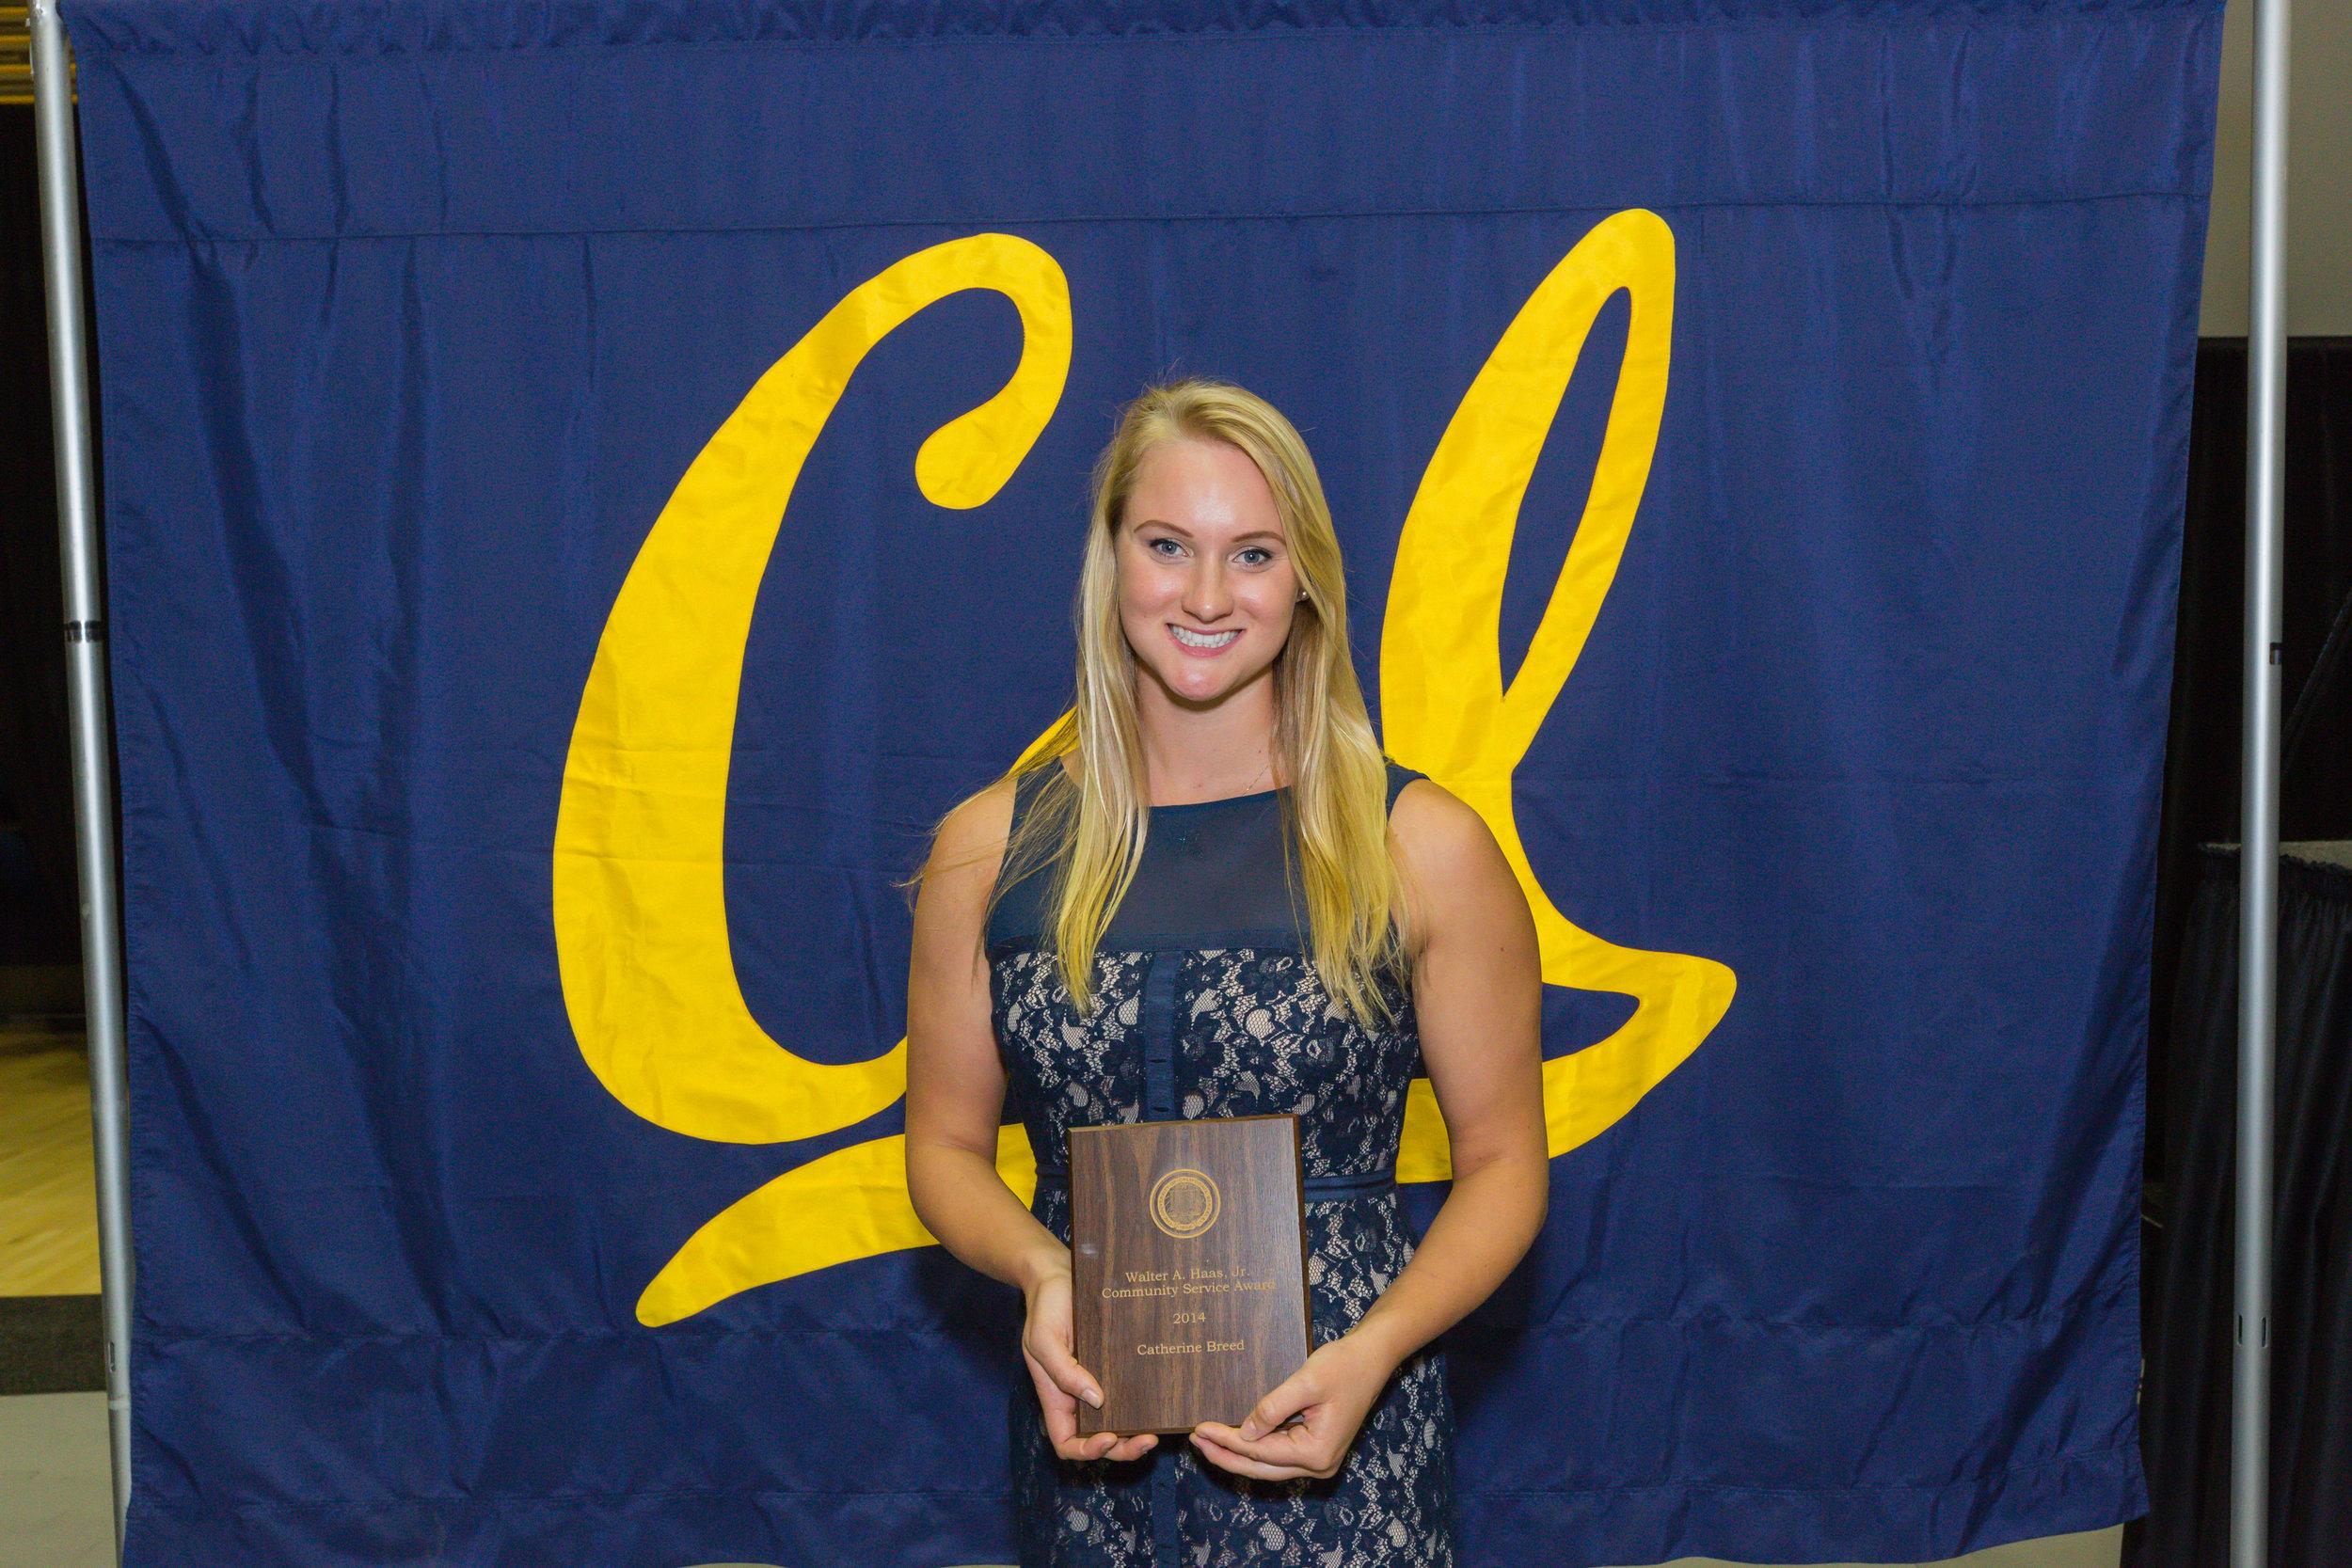 1314 WSwim - Breed Catherine Haas Community Service Award2-NP.jpg